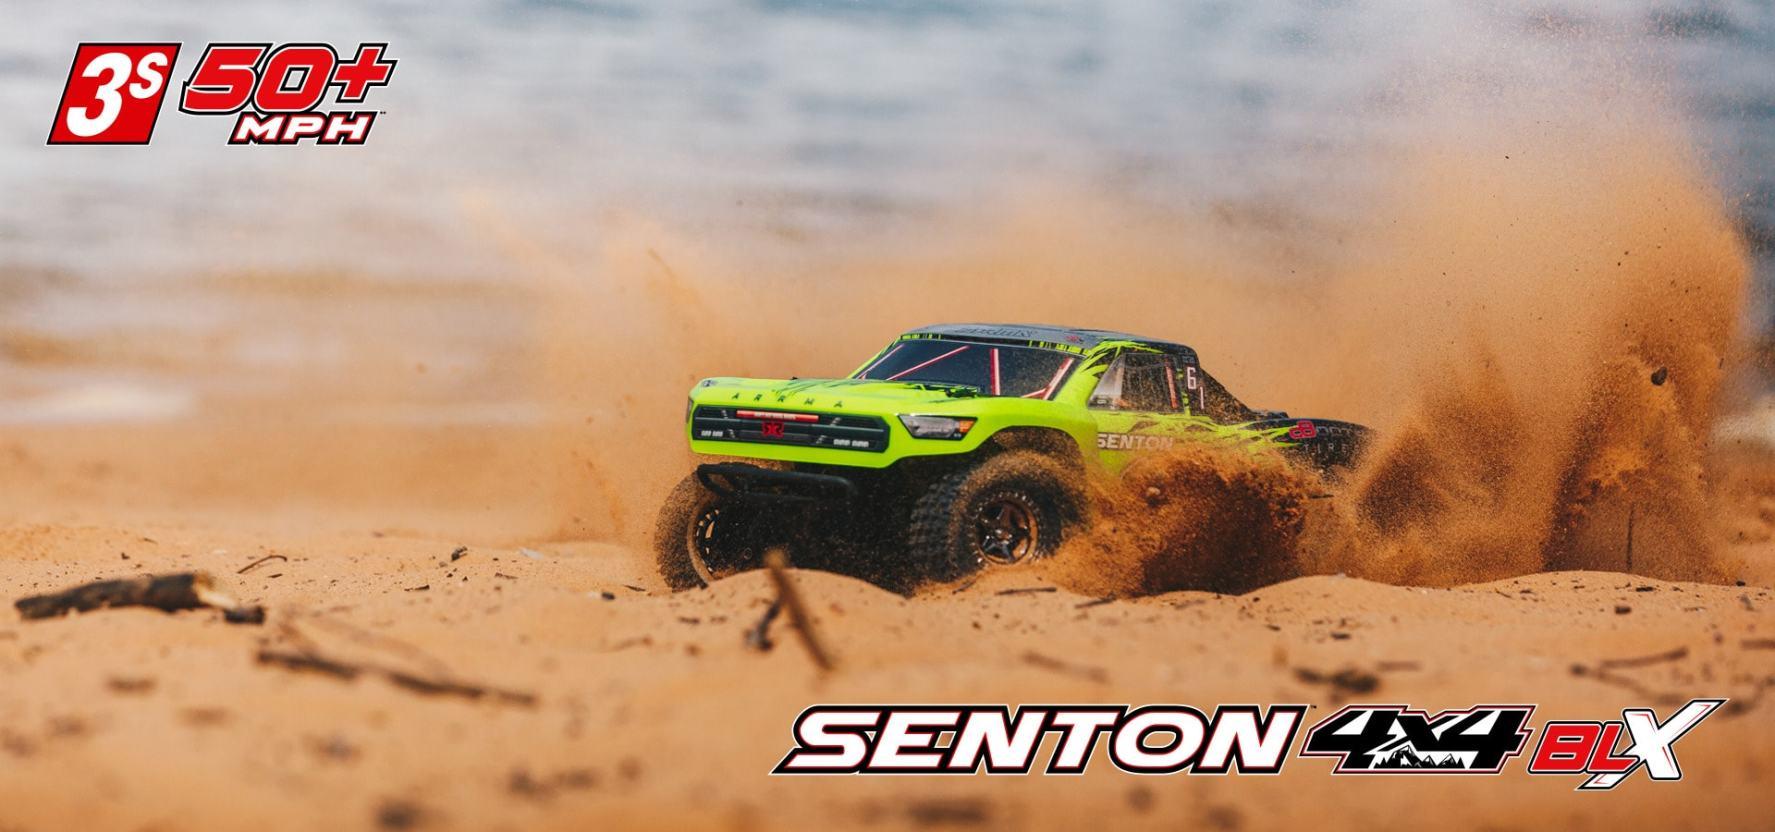 See It In Action ARRMA Senton 4x4 3S BLX Video